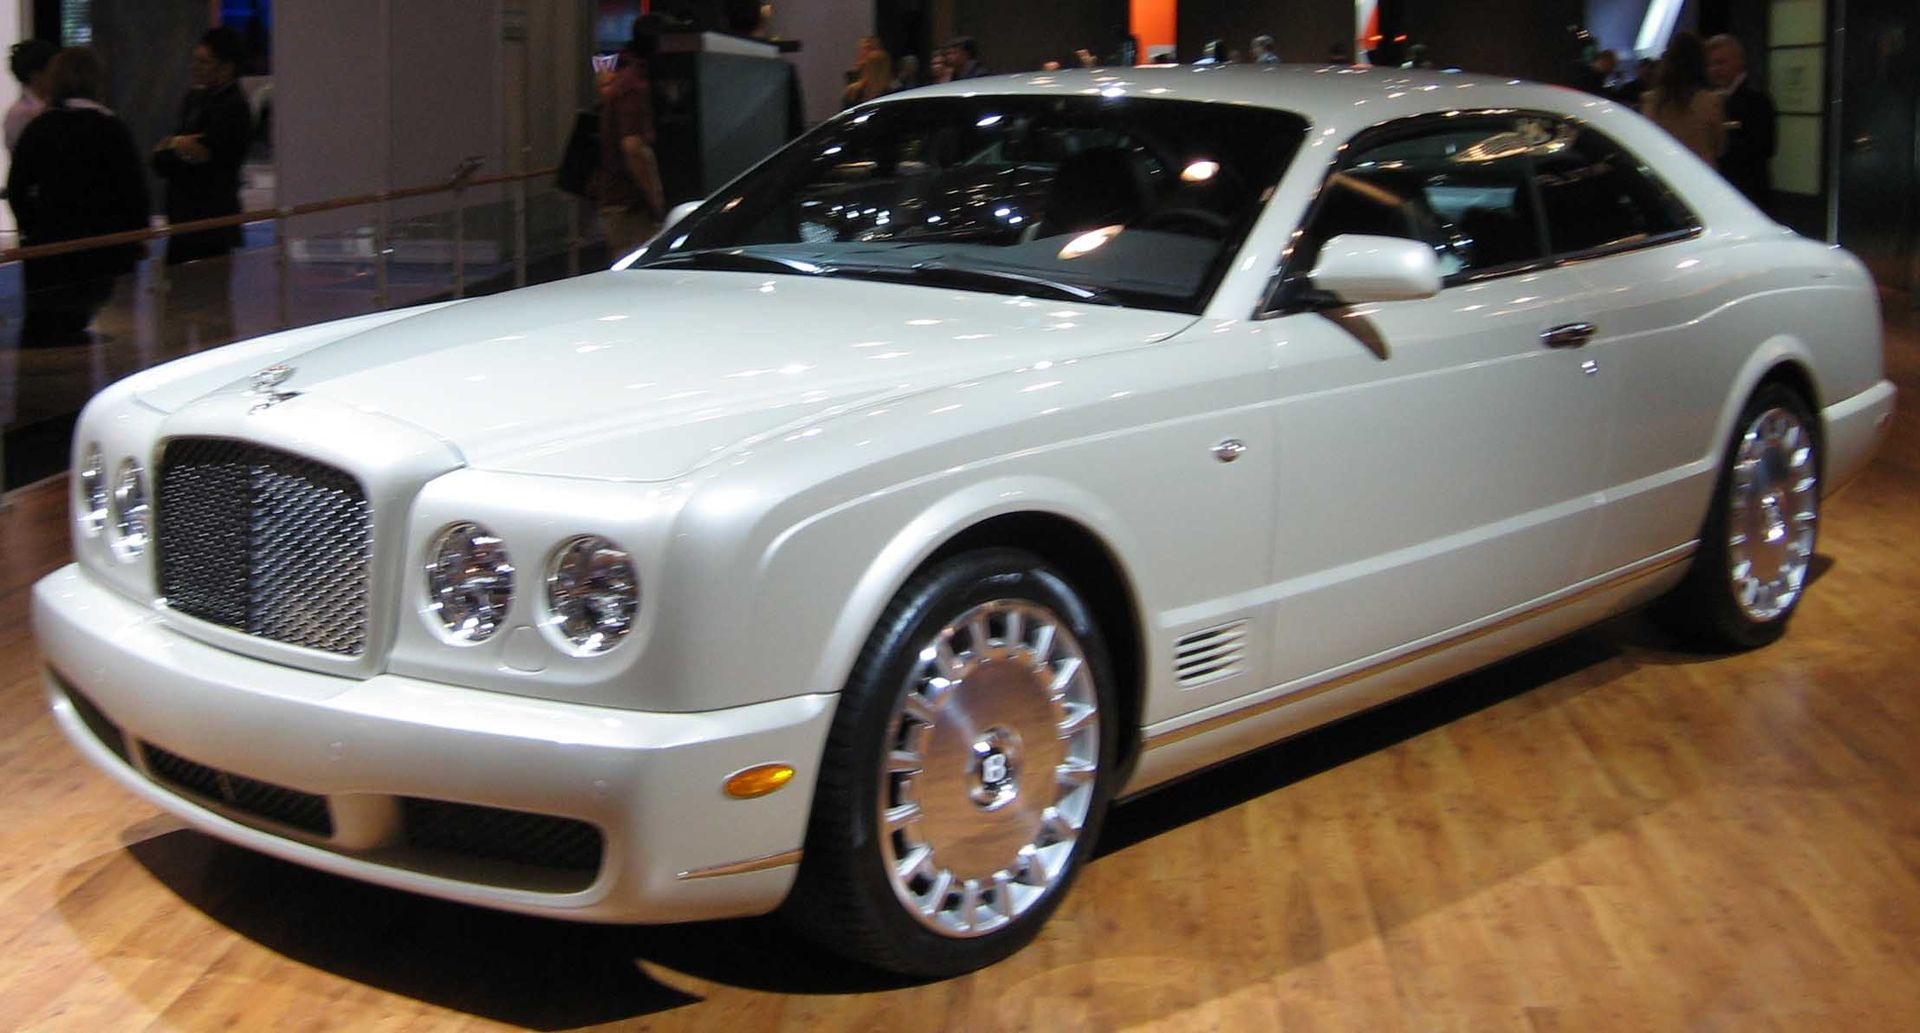 Bentley Continental Dimensions >> Bentley Brooklands Coupé - Wikipedia